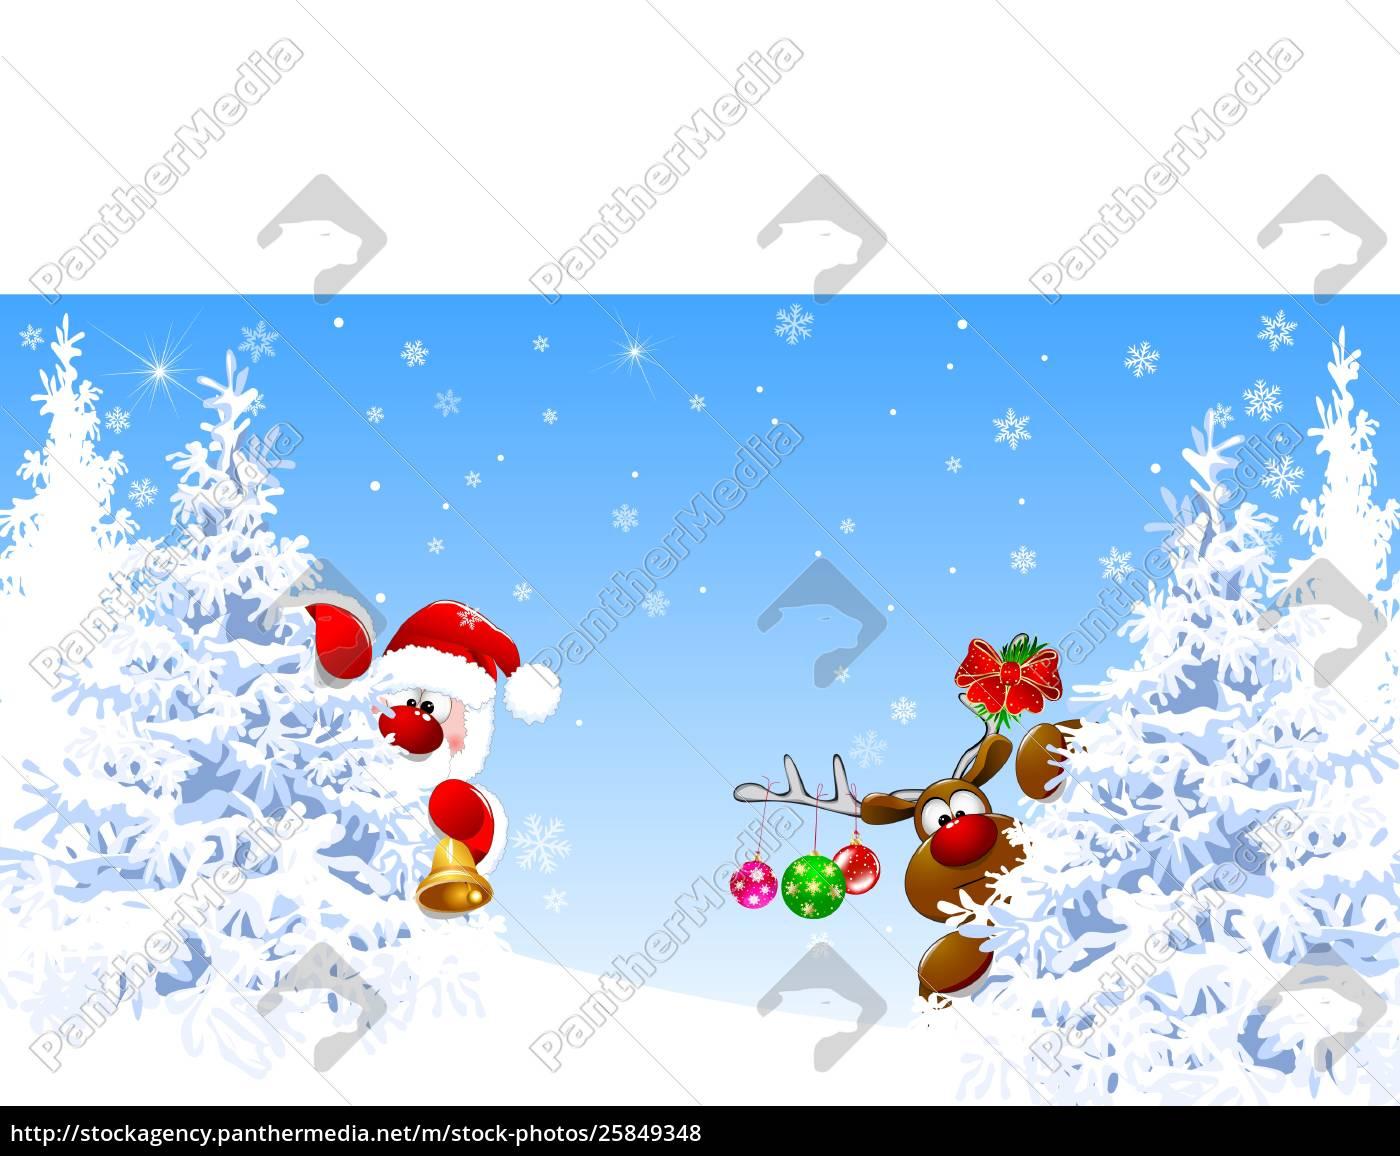 santa, claus, and, deer, in, the - 25849348